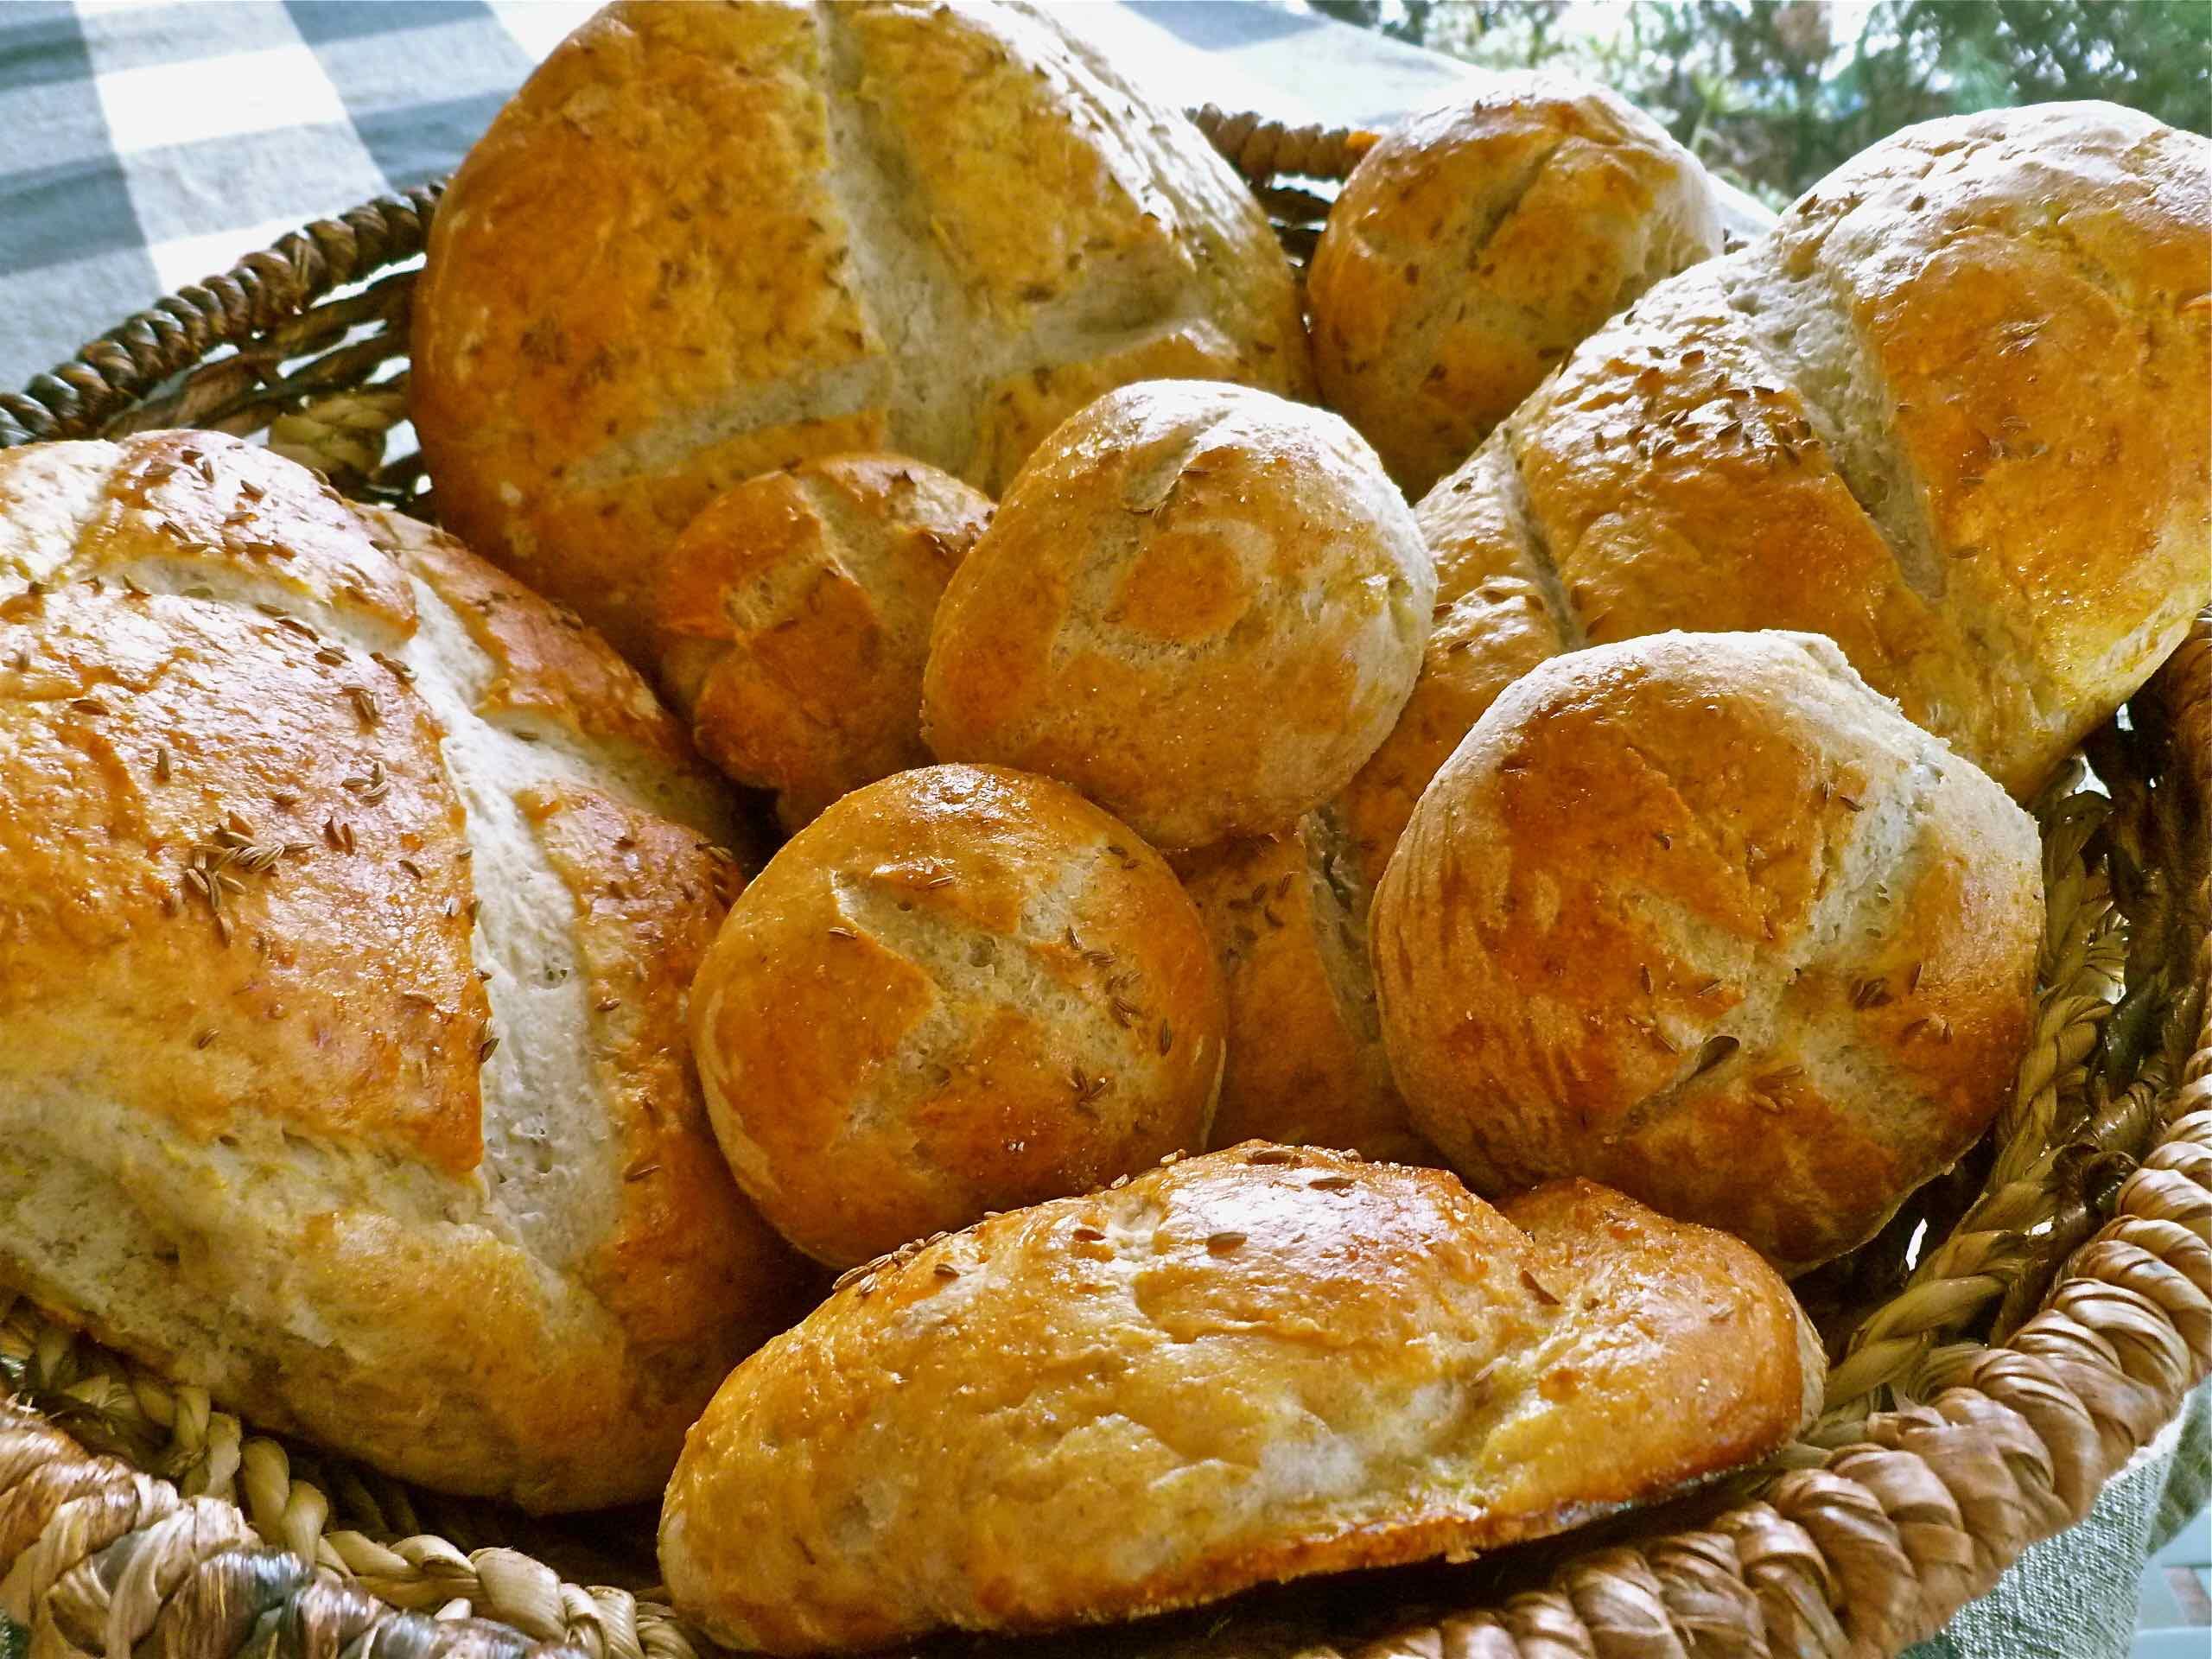 German Rye Bread lutzflcat